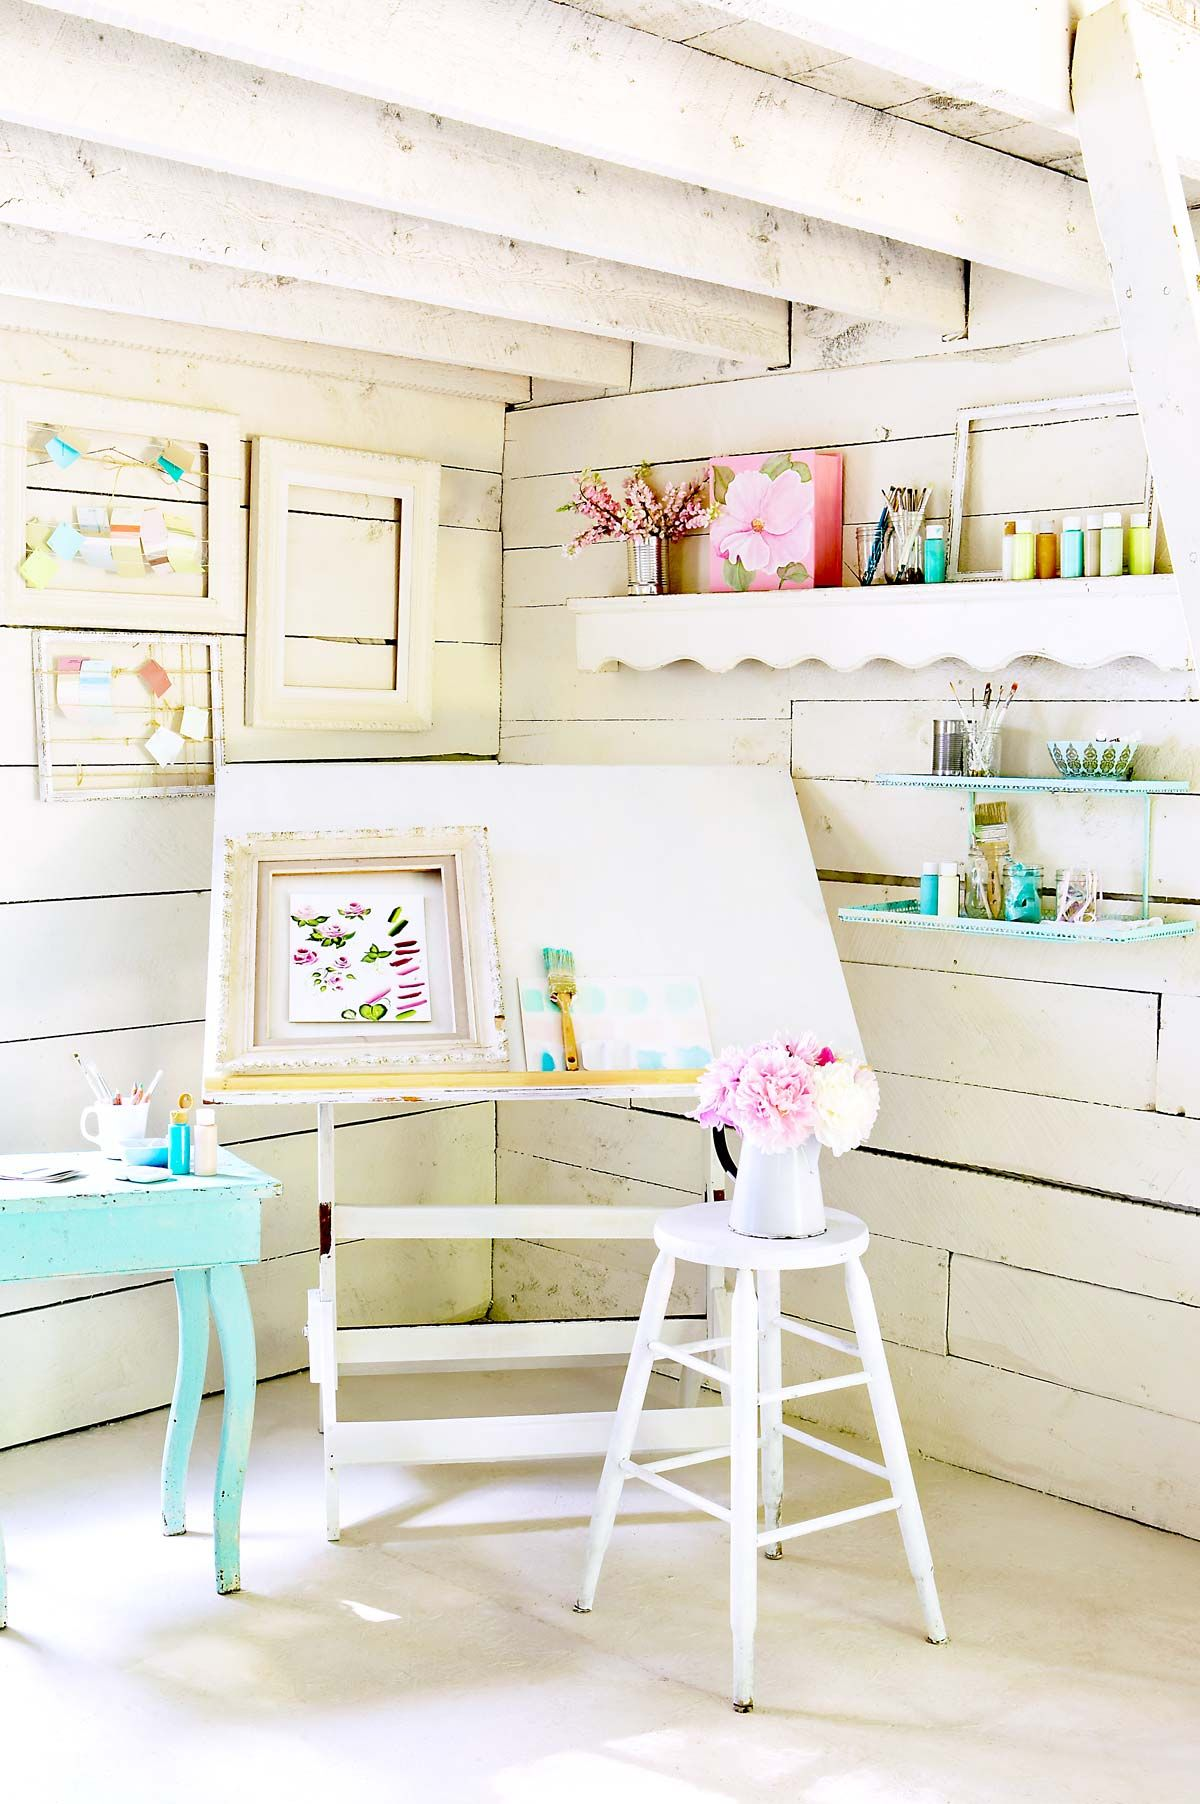 diy kids room art homework desk ideas with storage solutions rh pinterest com